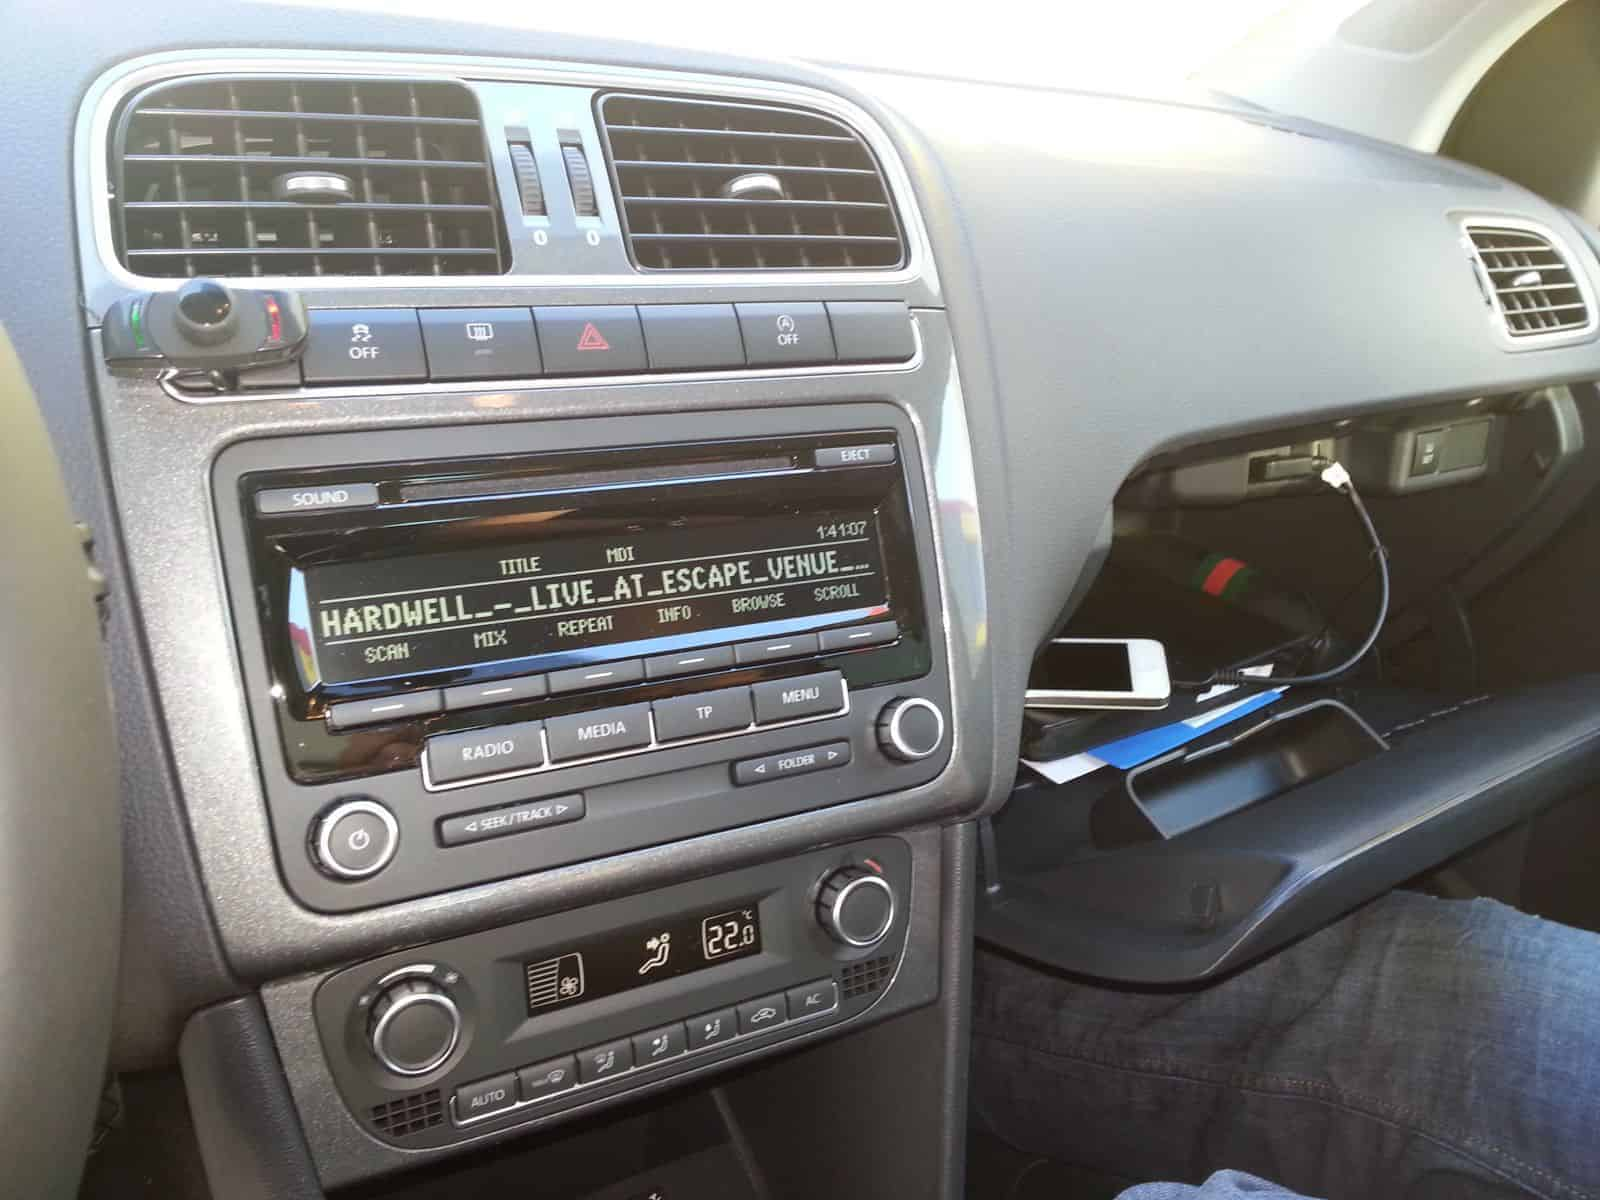 Ami Kabel Ipod Iphone Ipad Audi Volkswagen Skoda Amp Seat